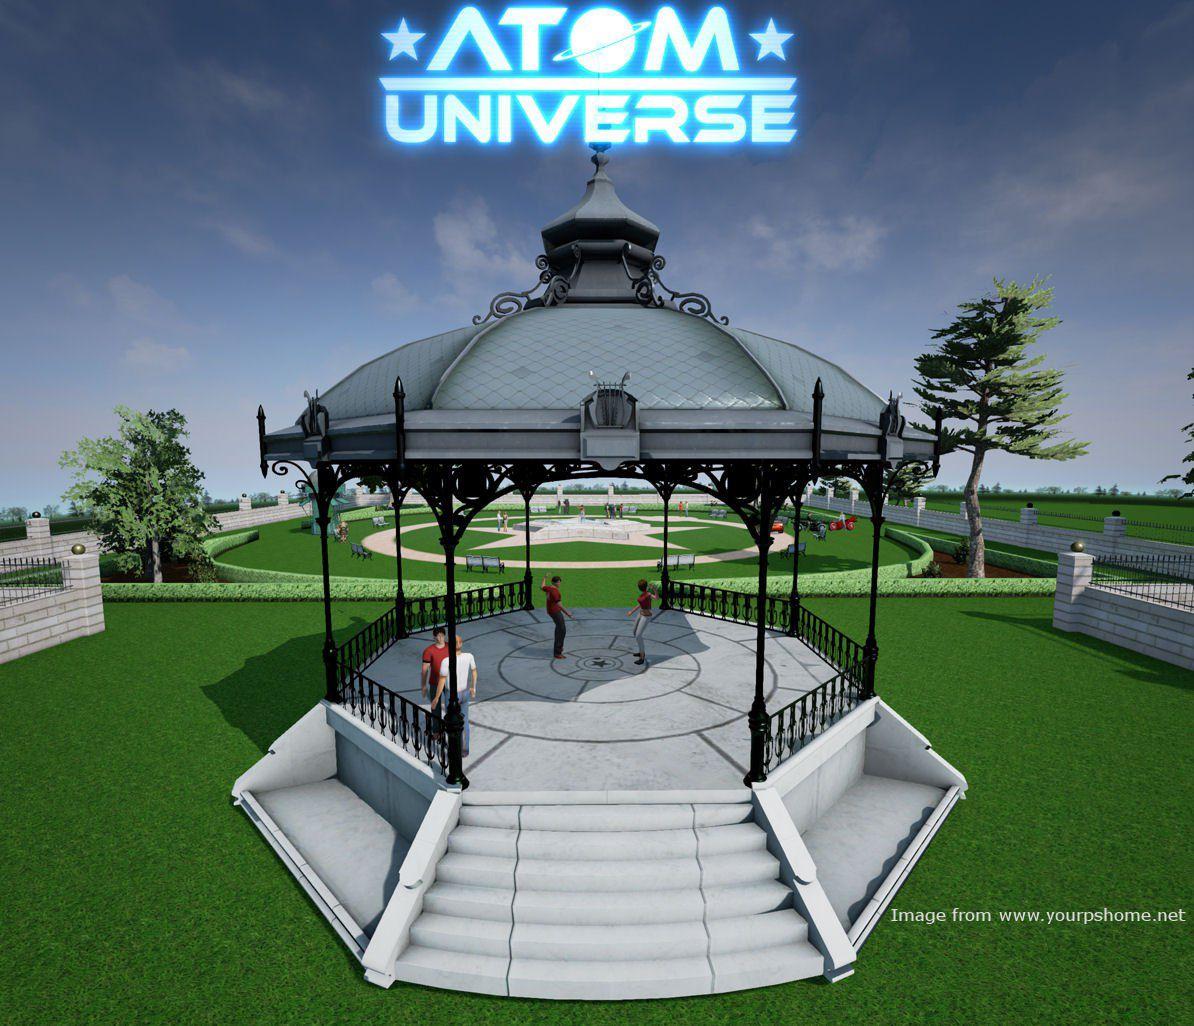 Karen Talks To Atom Republic About Atom Universe, kwoman32, Nov 30, 2014, 4:55 PM, YourPSHome.net, jpg, Pavilion-copy.jpg